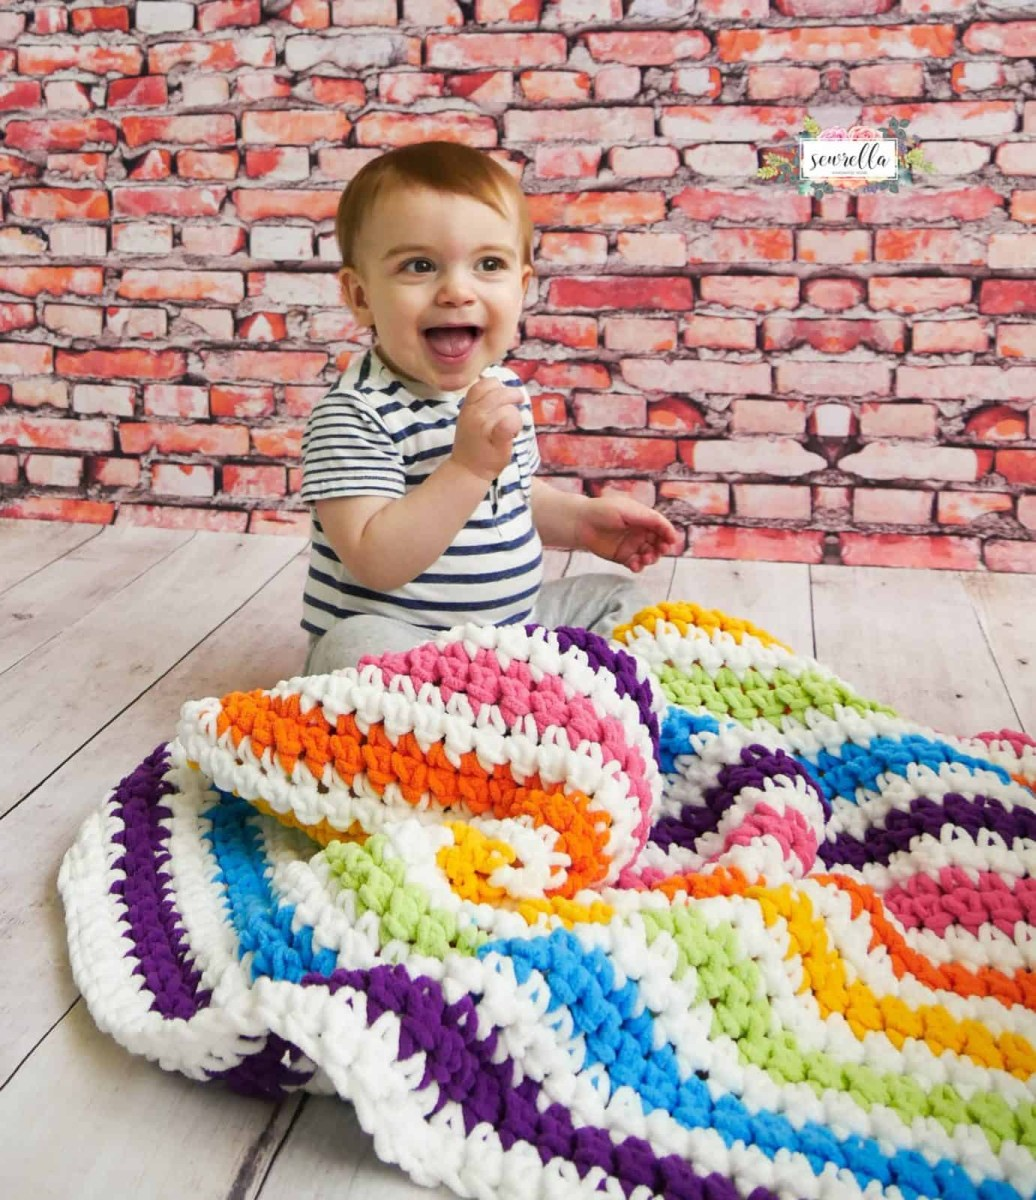 Basic & Standard Patterns for Boy Blanket Crochet Stripe Crochet Ba Blanket Patterns To Add A Pop Of Color